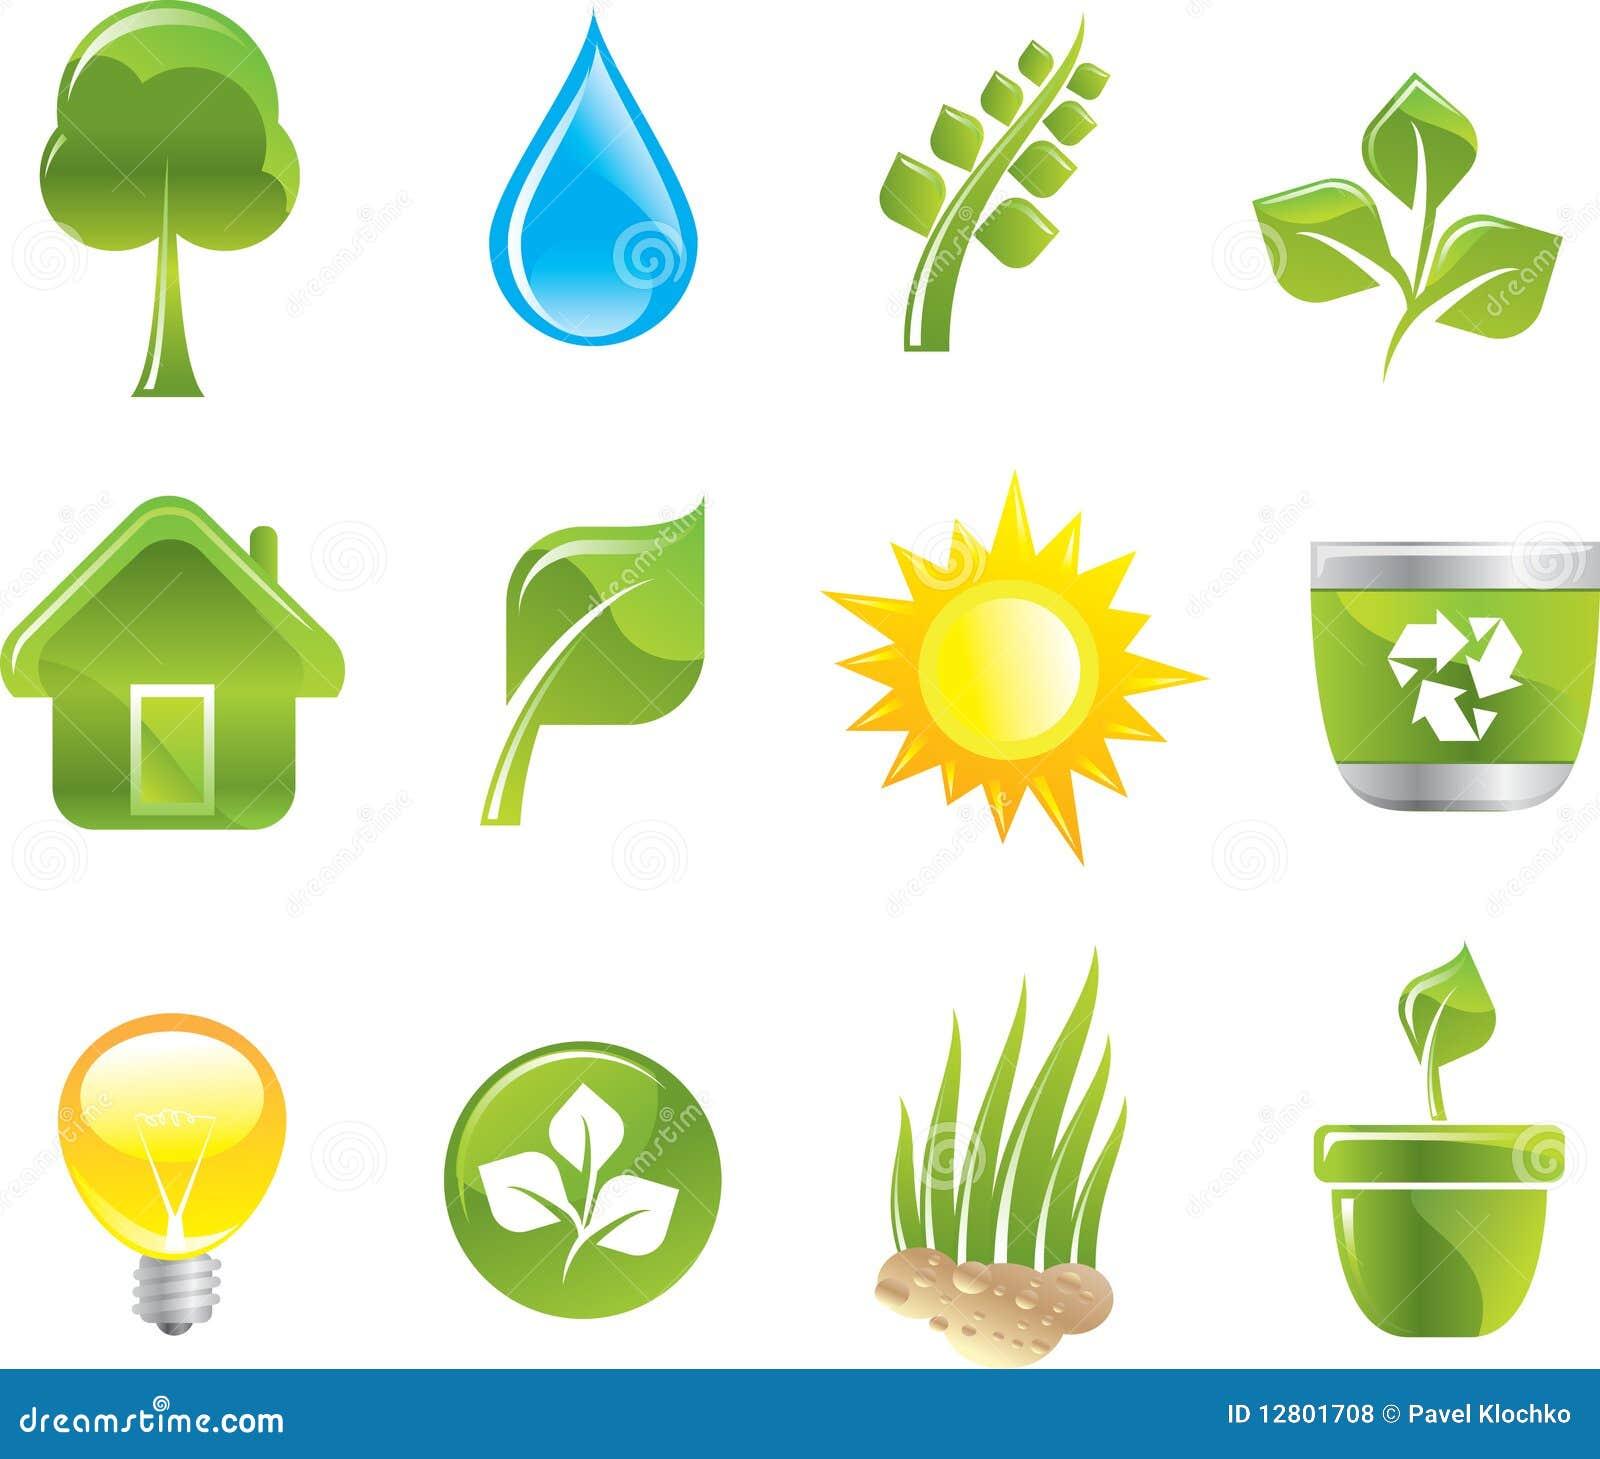 Ícones verdes ajustados